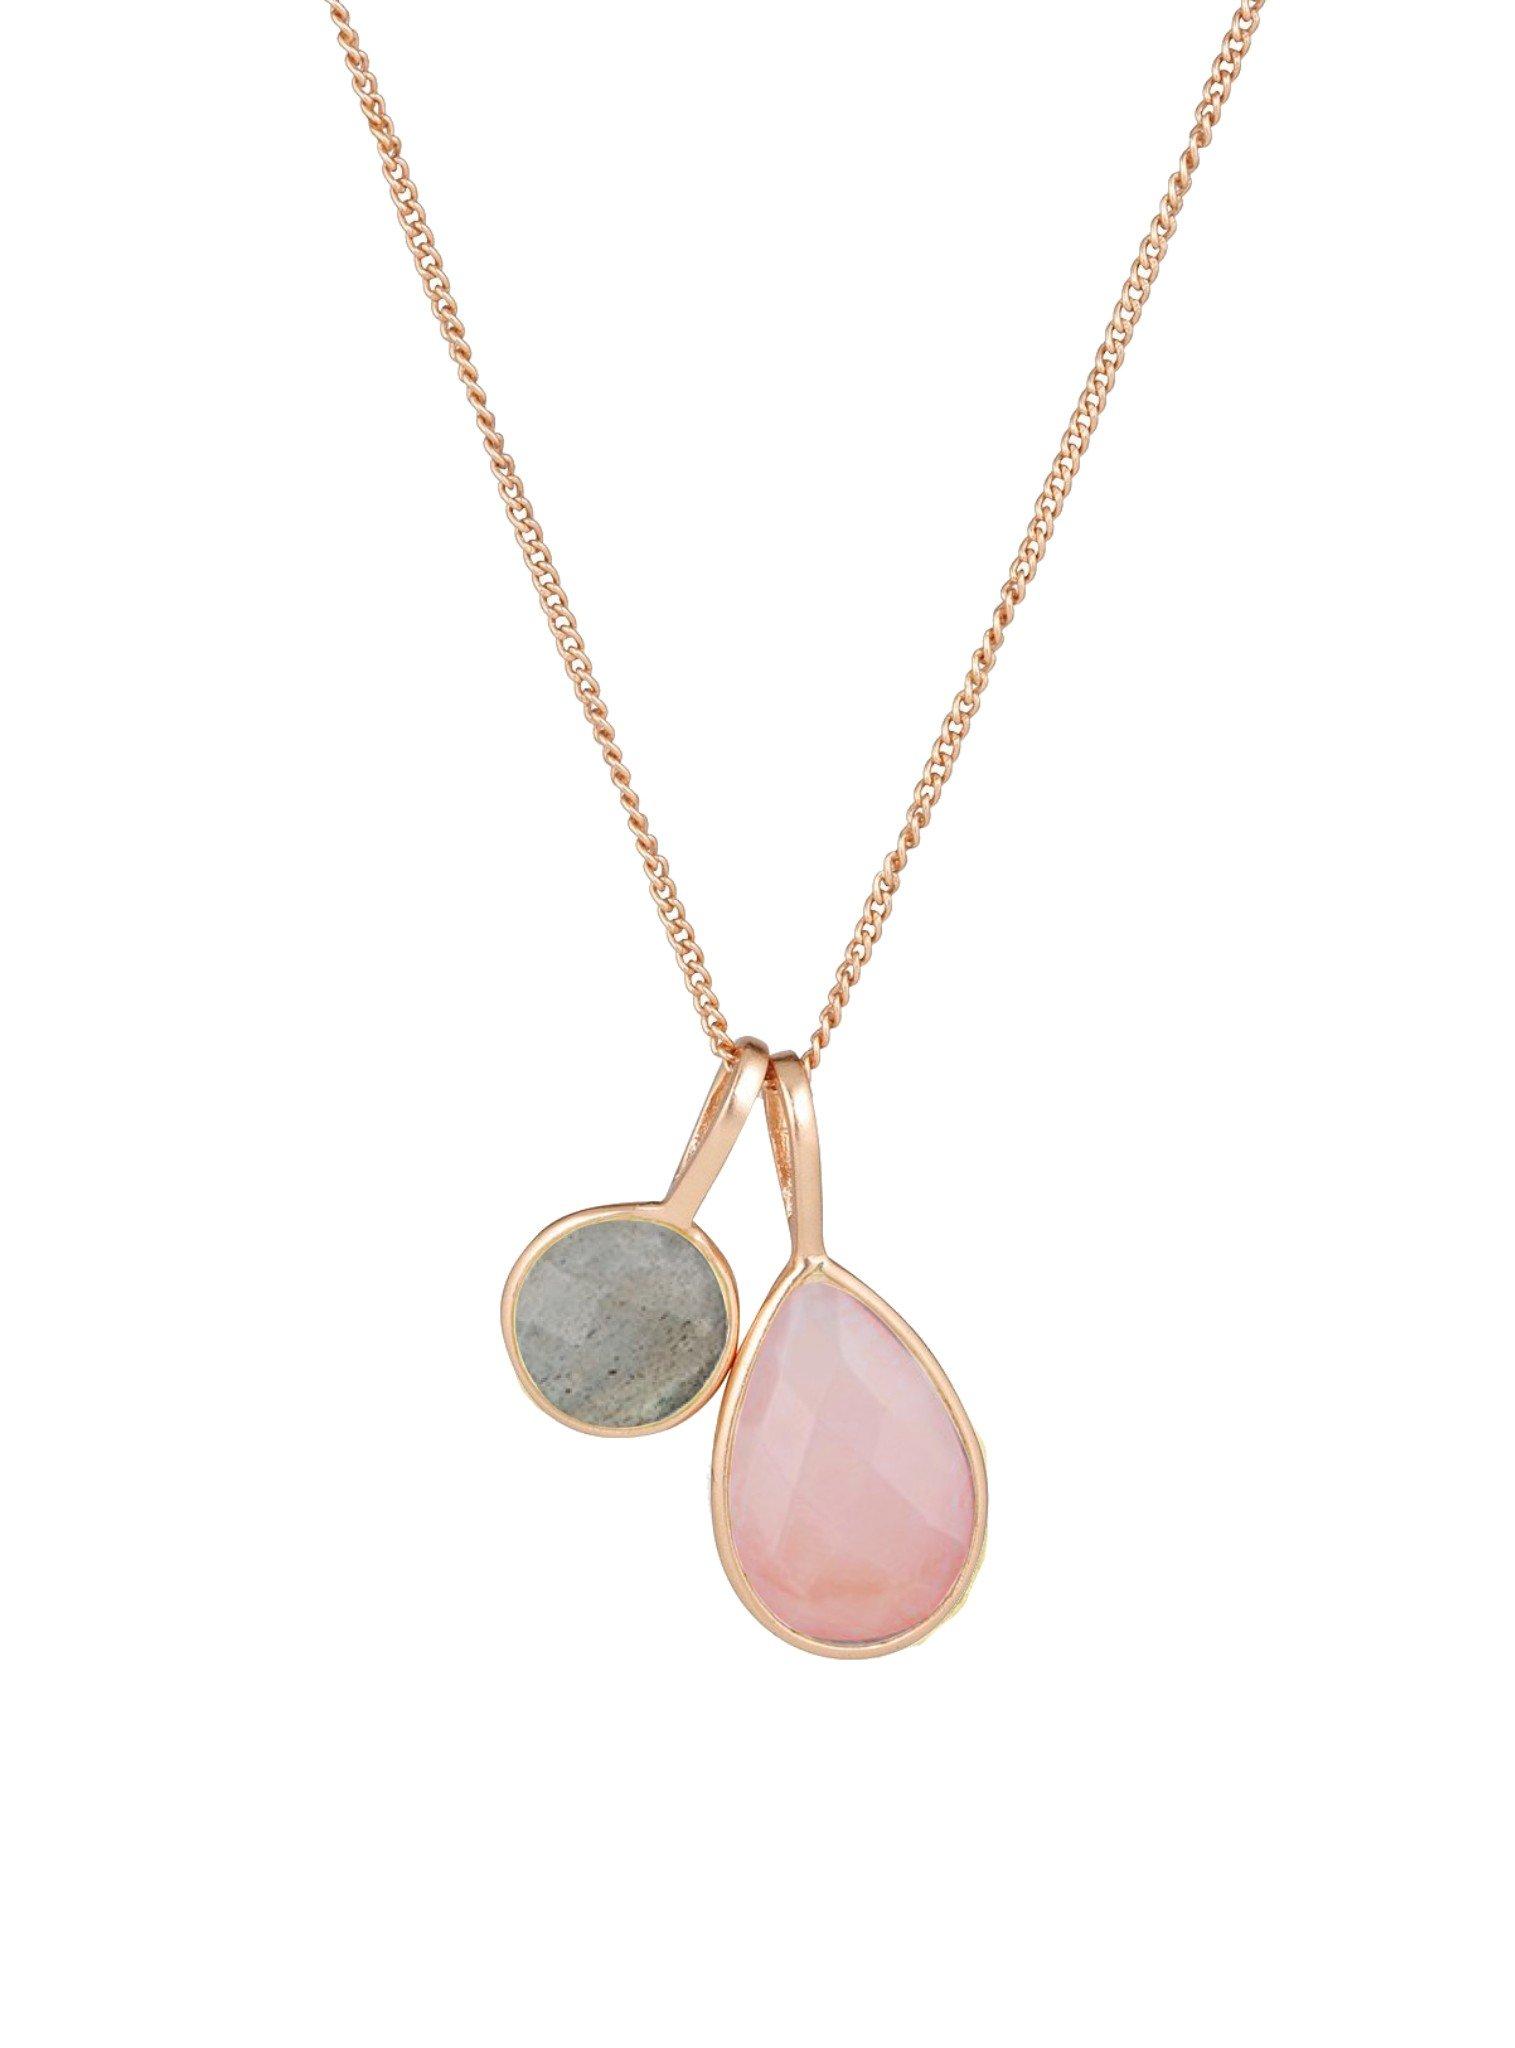 Selene Double Pendant Rose Quartz Laboradorite Necklace Rose Gold